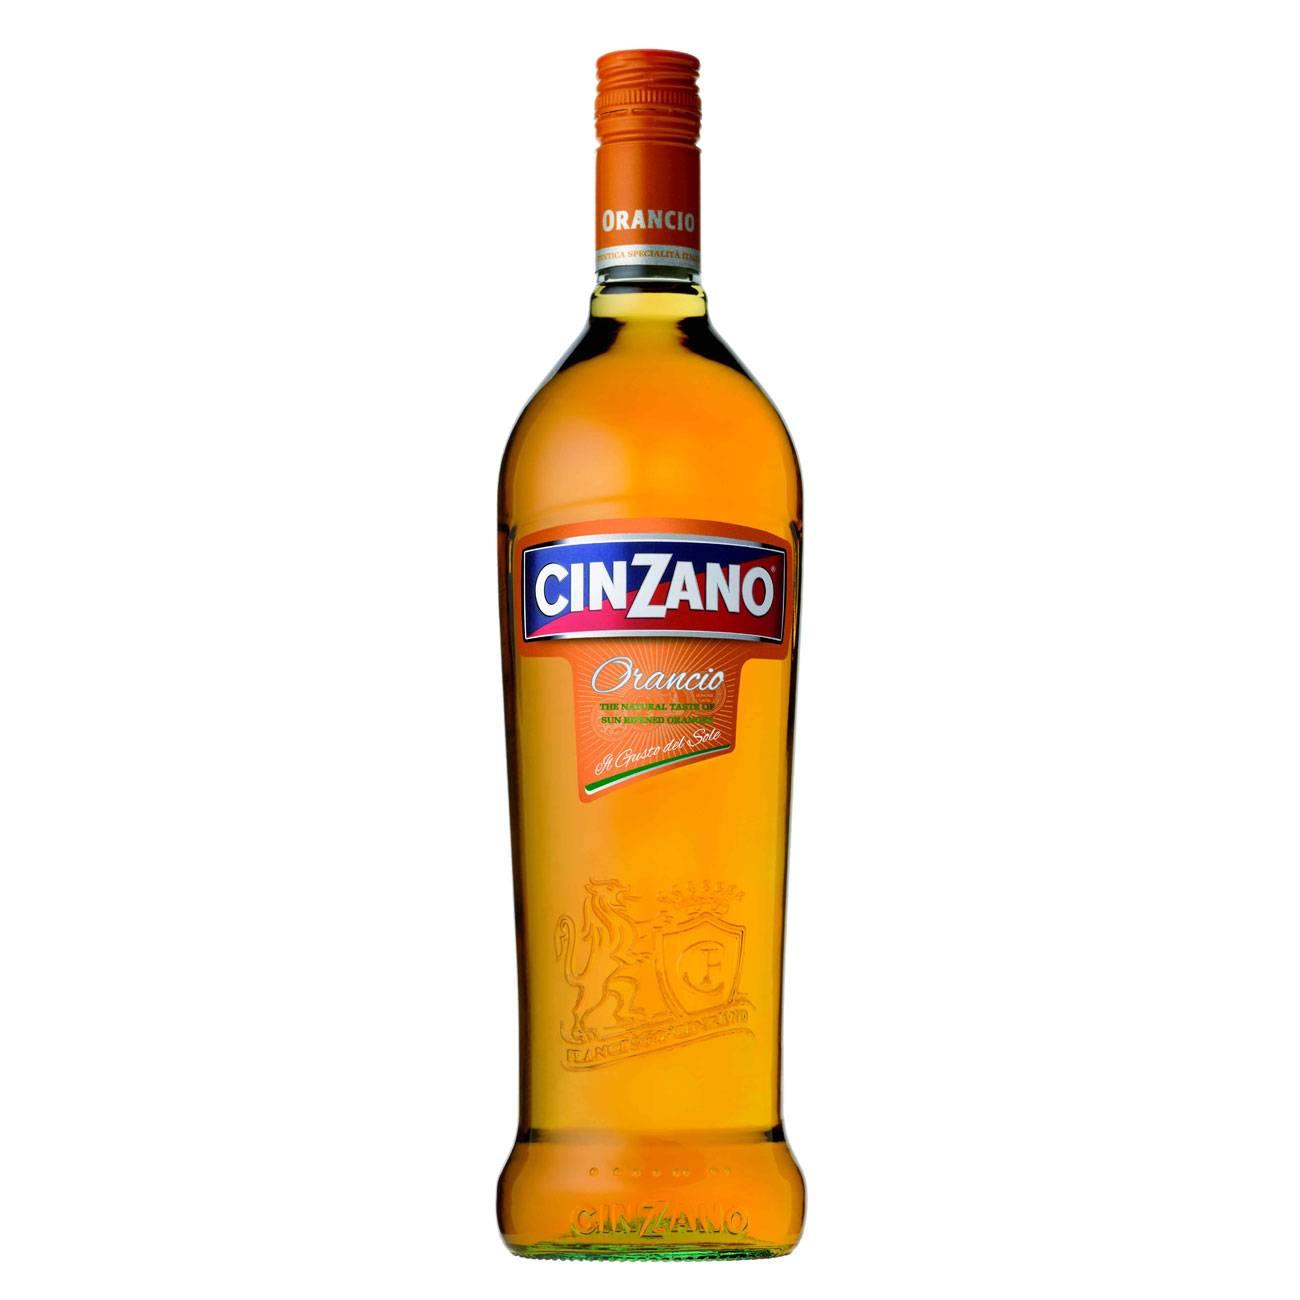 Aperitive si vermut, Orancio 1000 ML, Cinzano